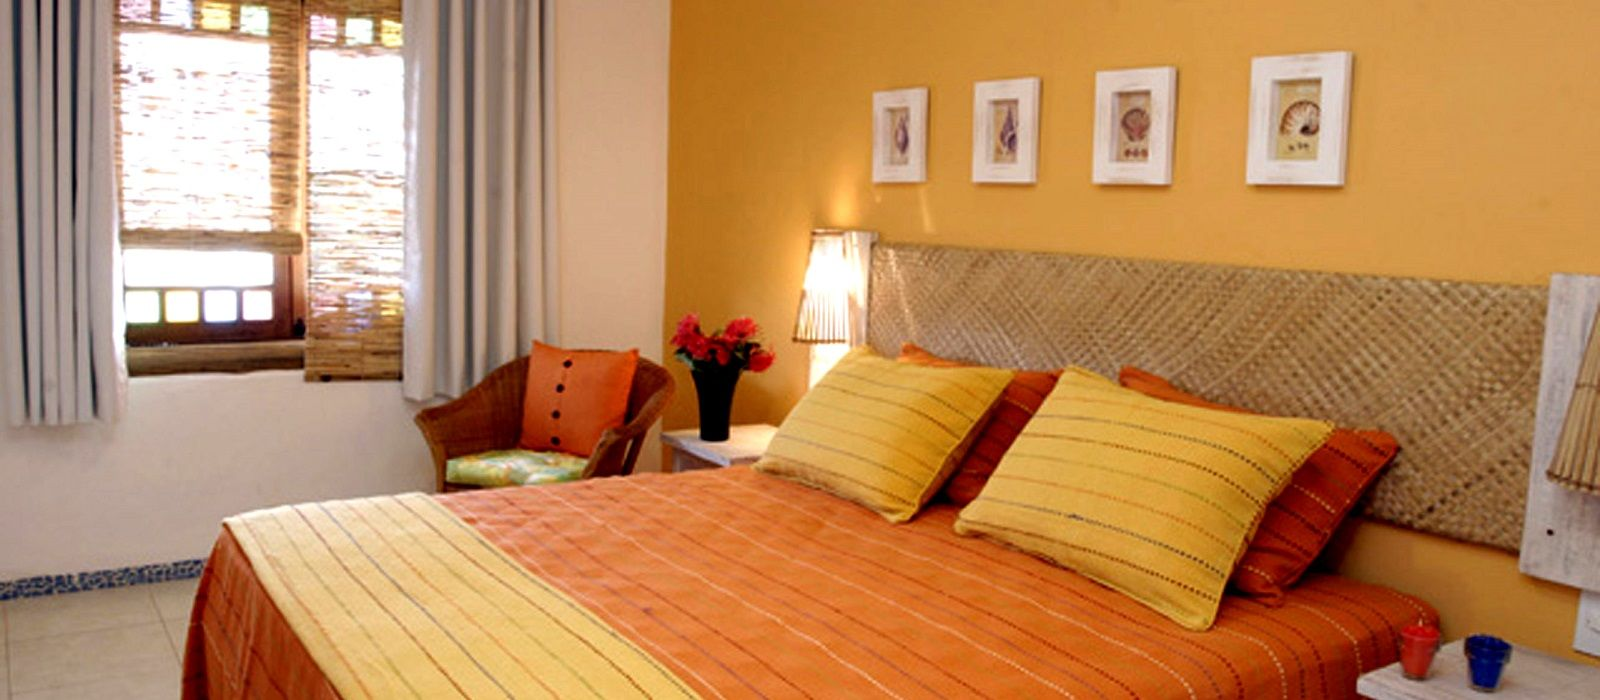 Hotel Via dos Corais Brazil